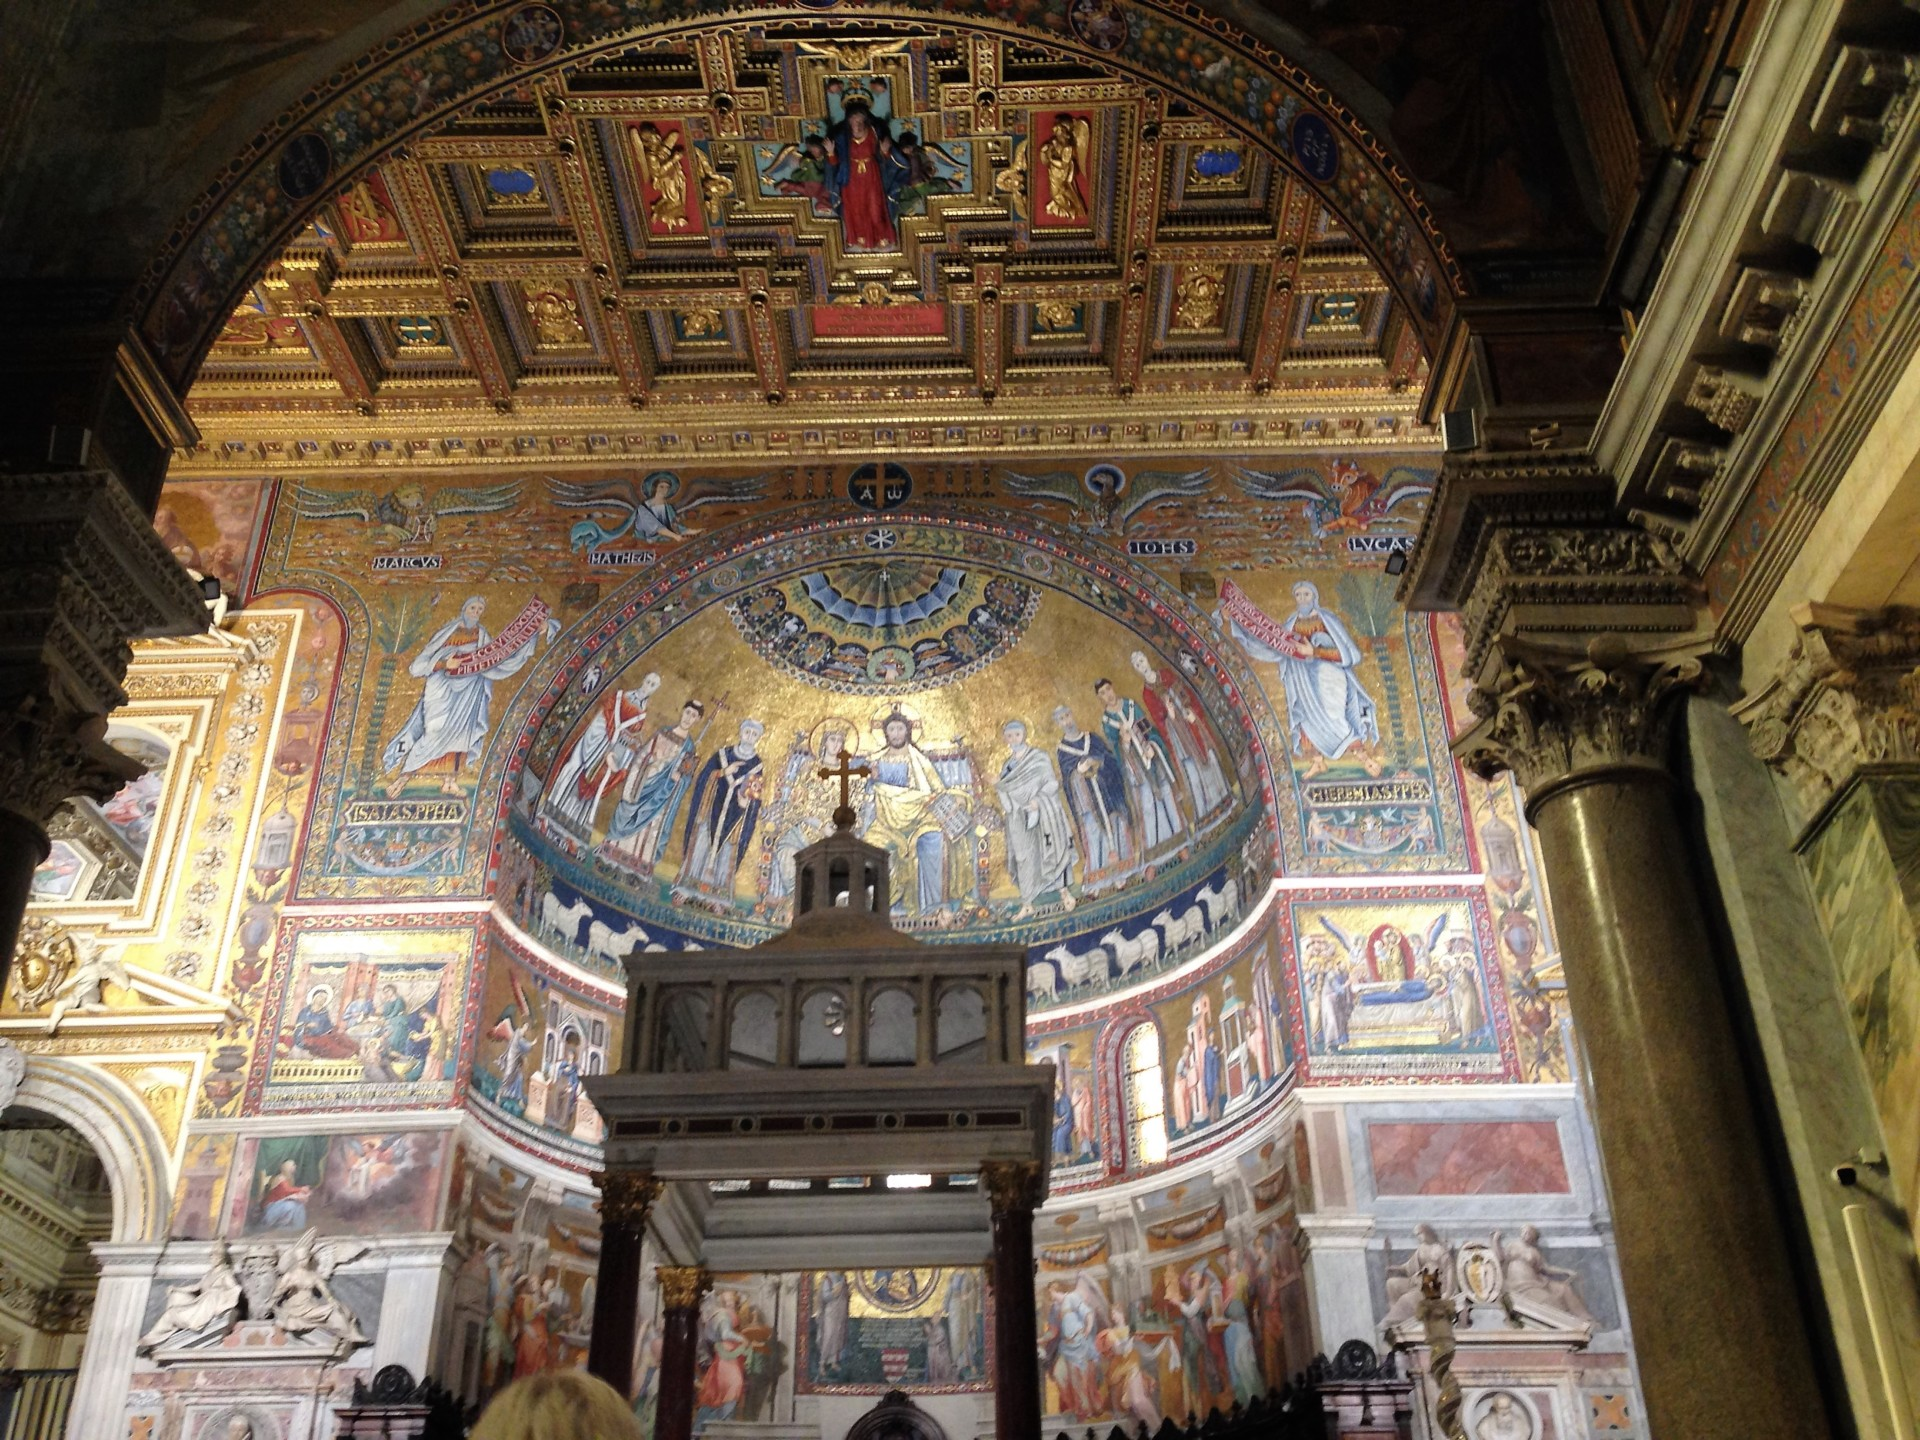 Santa Maria in Trastevere, Mosaik in der Chor-Apsis